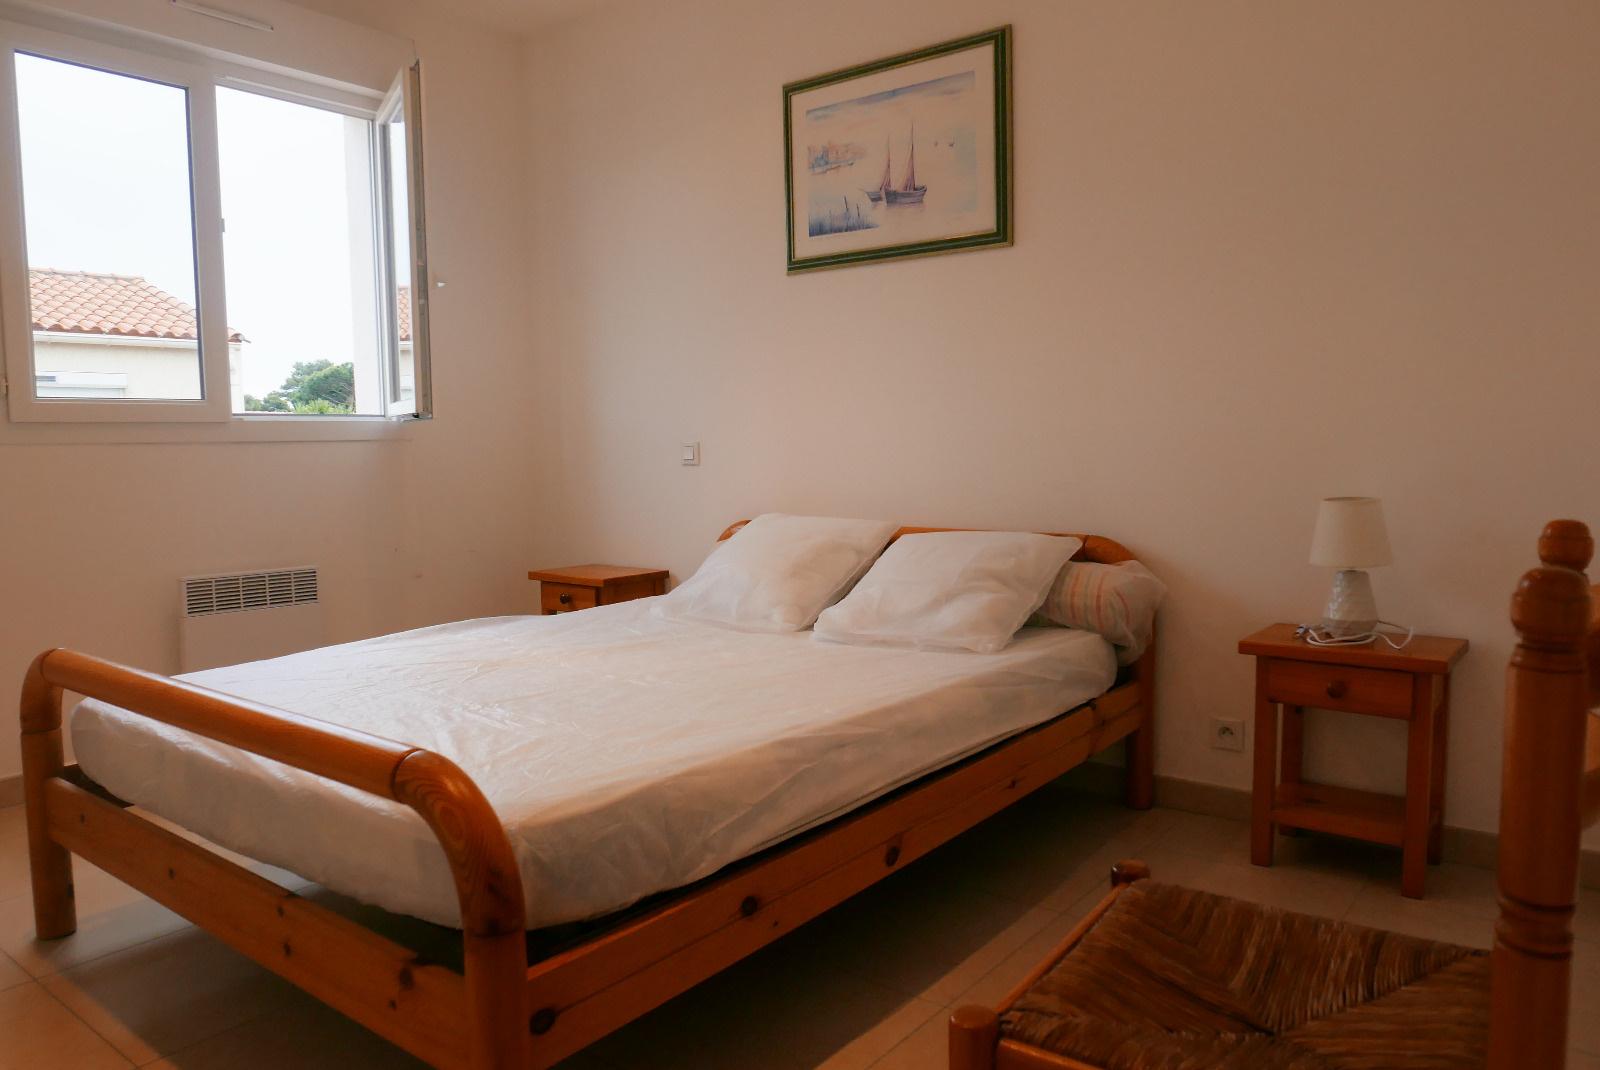 Chambre avec lit en 140*